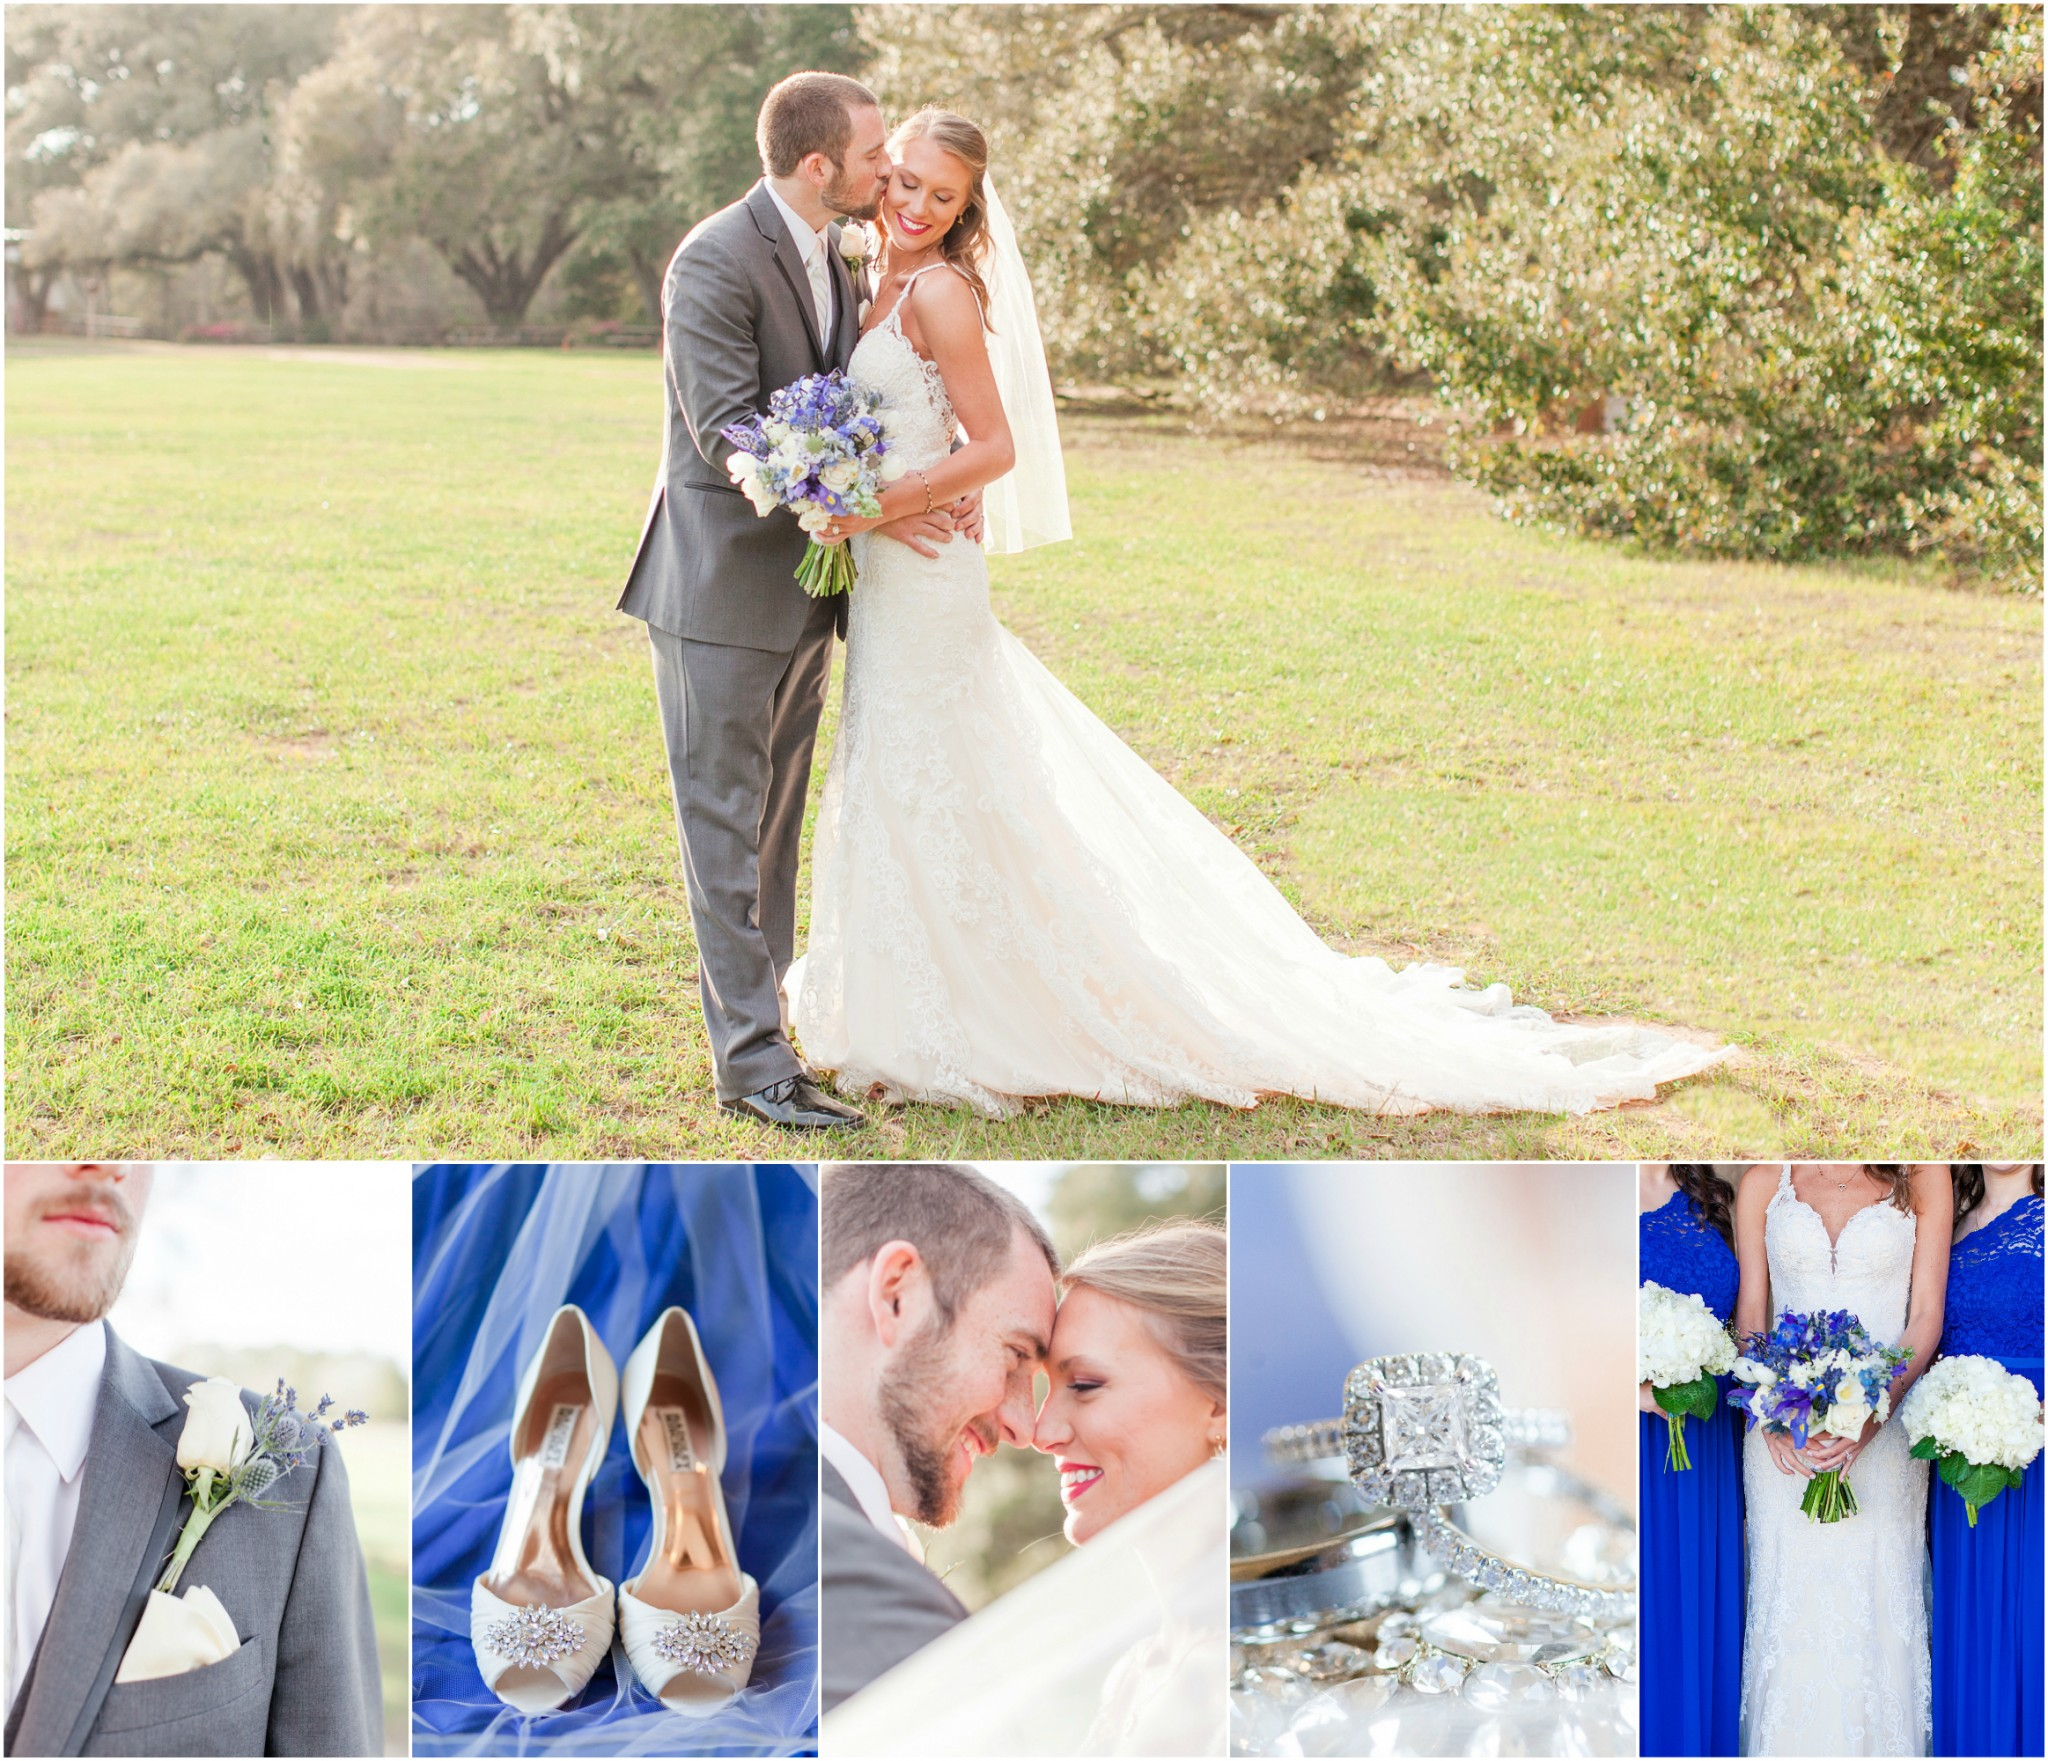 Justin and Leah's Oak Hollow Farm wedding in Fairhope AL